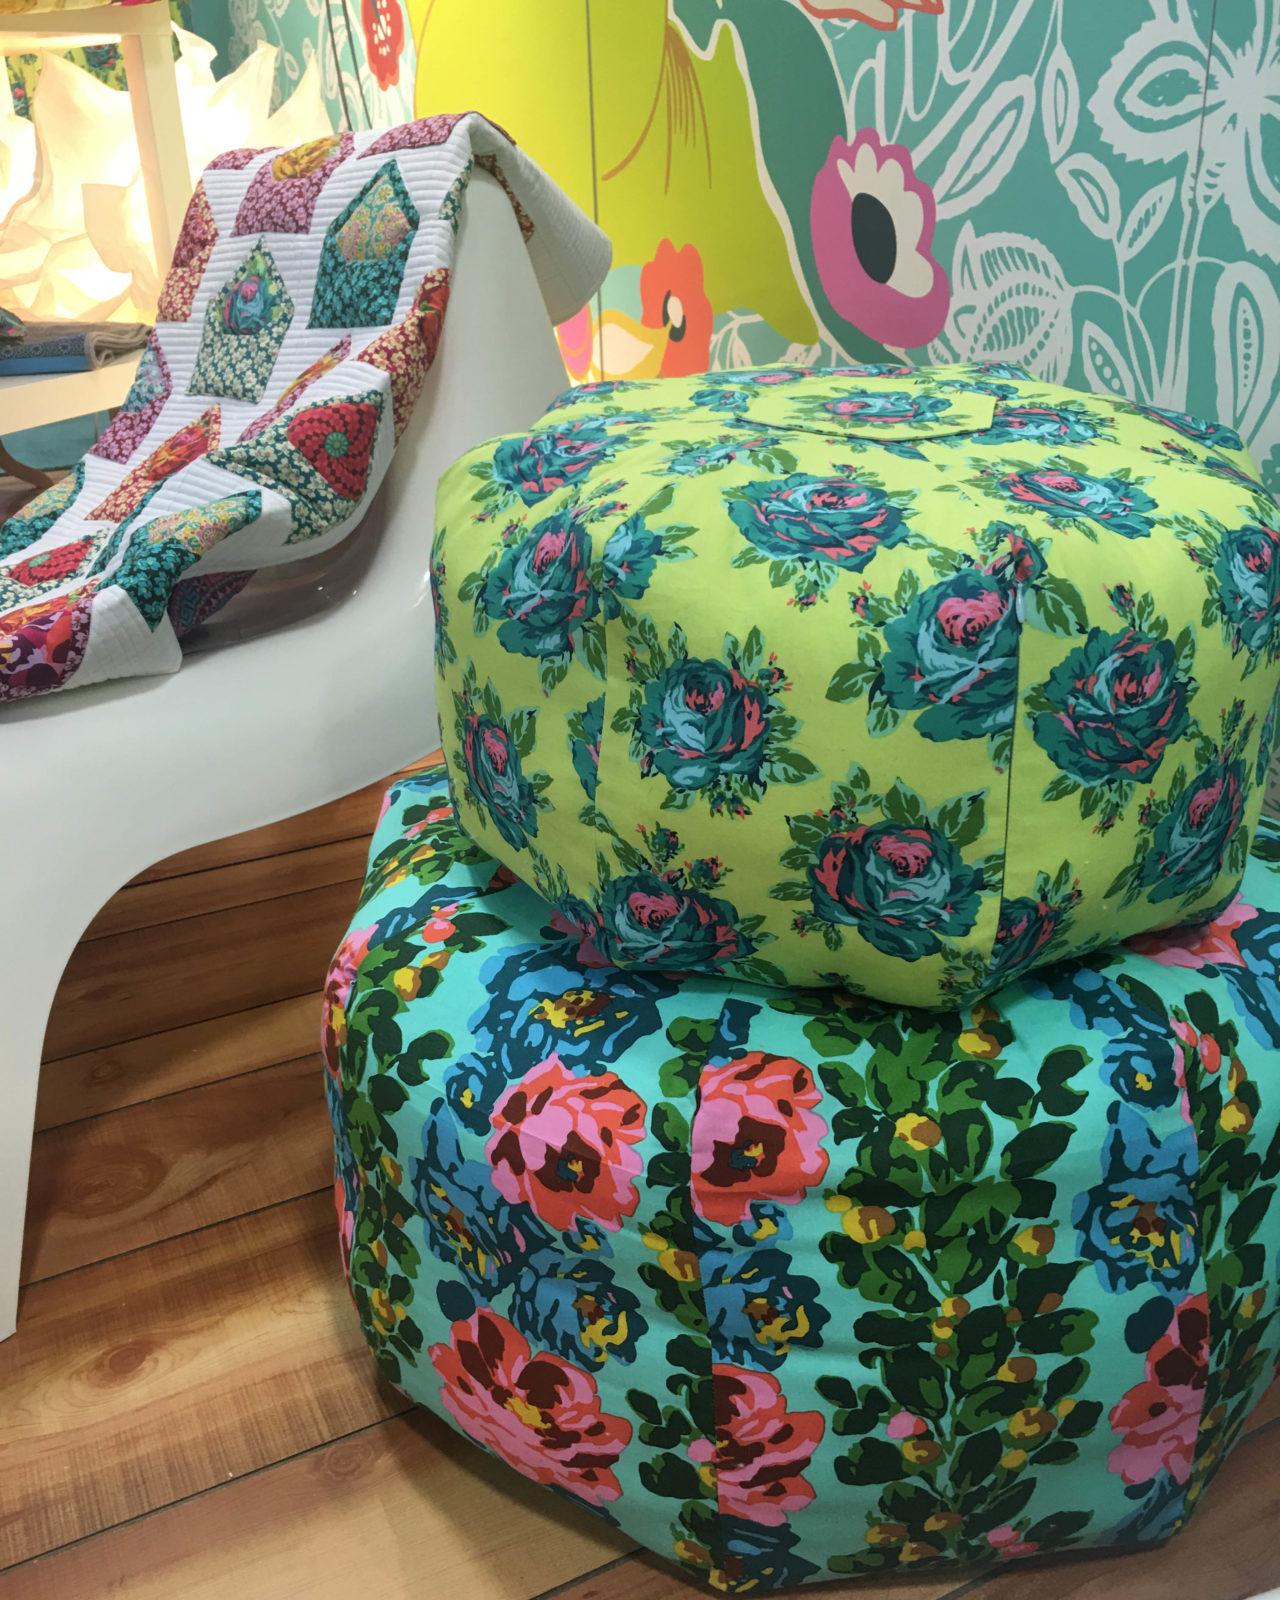 Amy Butler Circular Home Dec Pillow Poofs in Eternal Sunshine Fabric